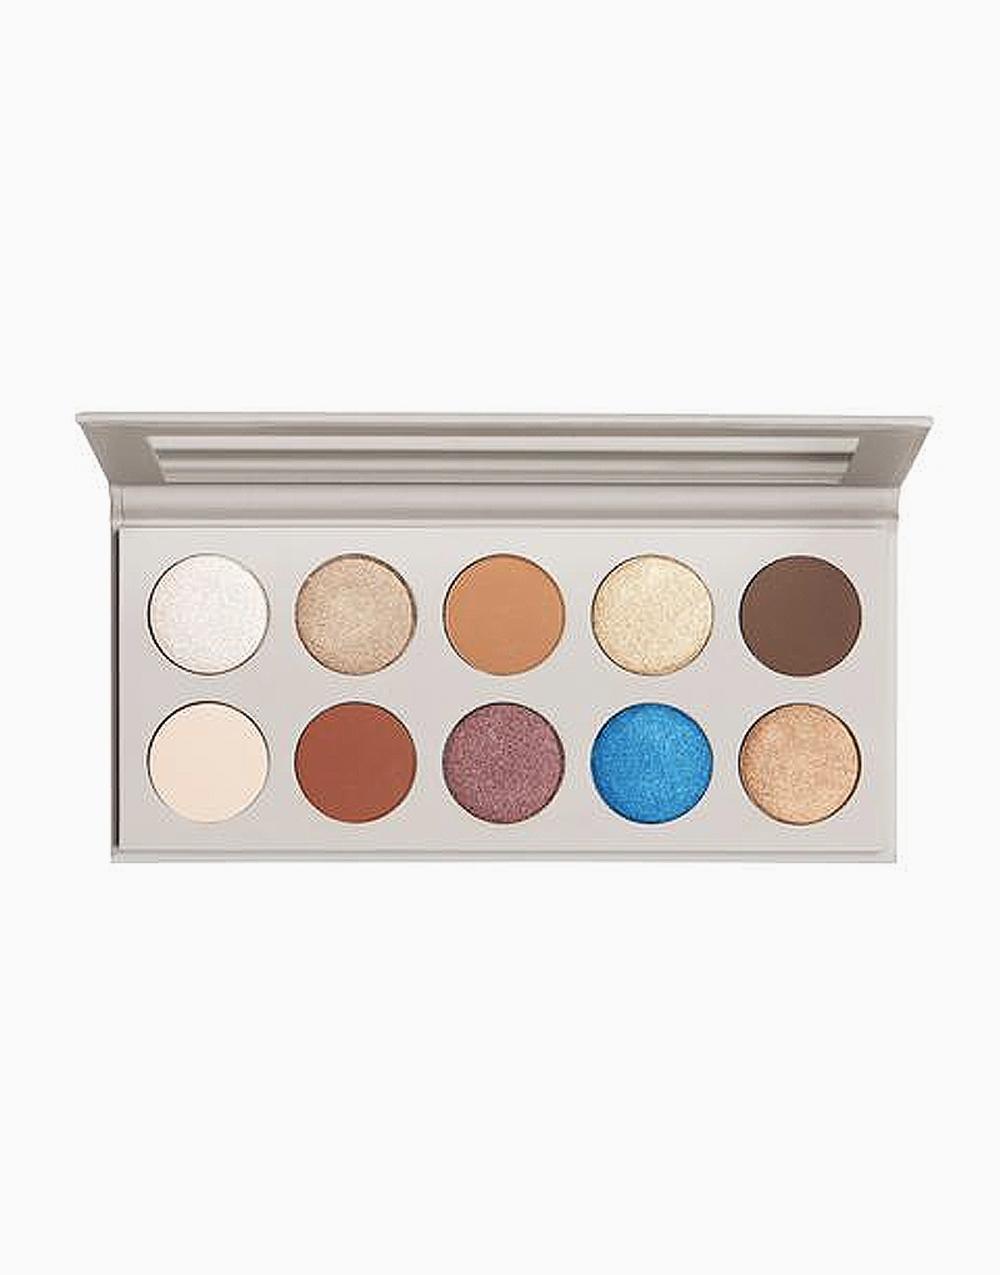 KKW Beauty x Mario 10 Pan Eyeshadow Palette by KKW Beauty